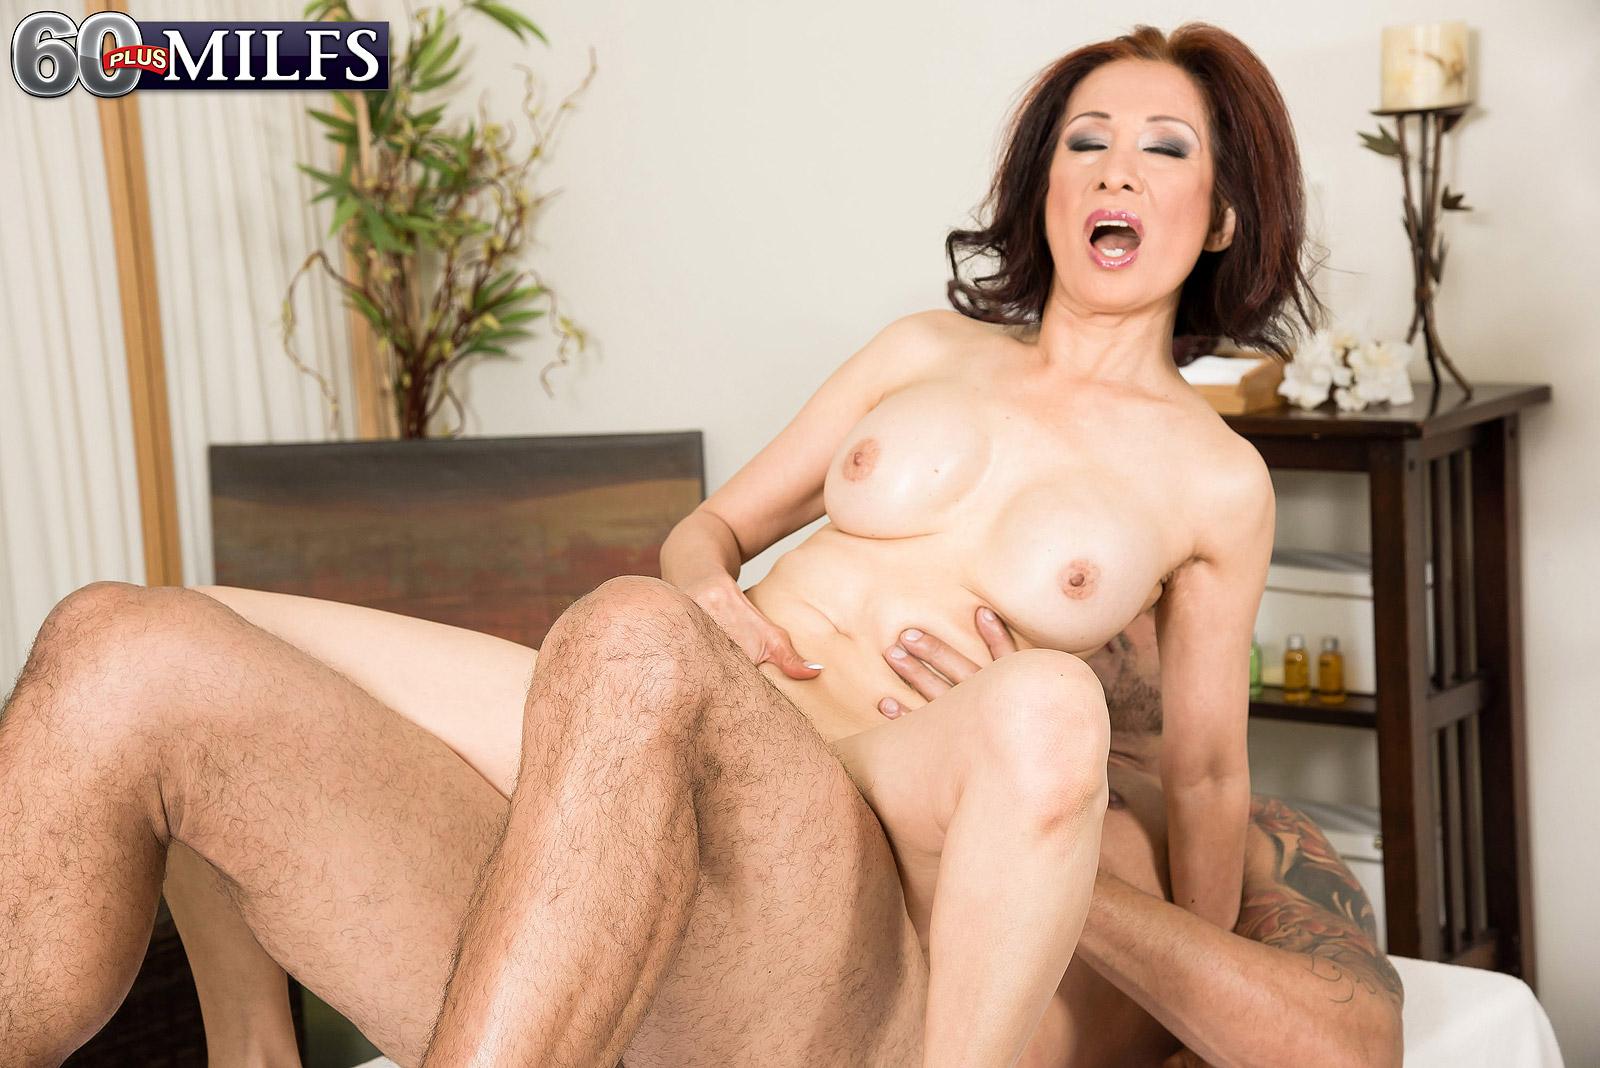 Nude wives amateur pics